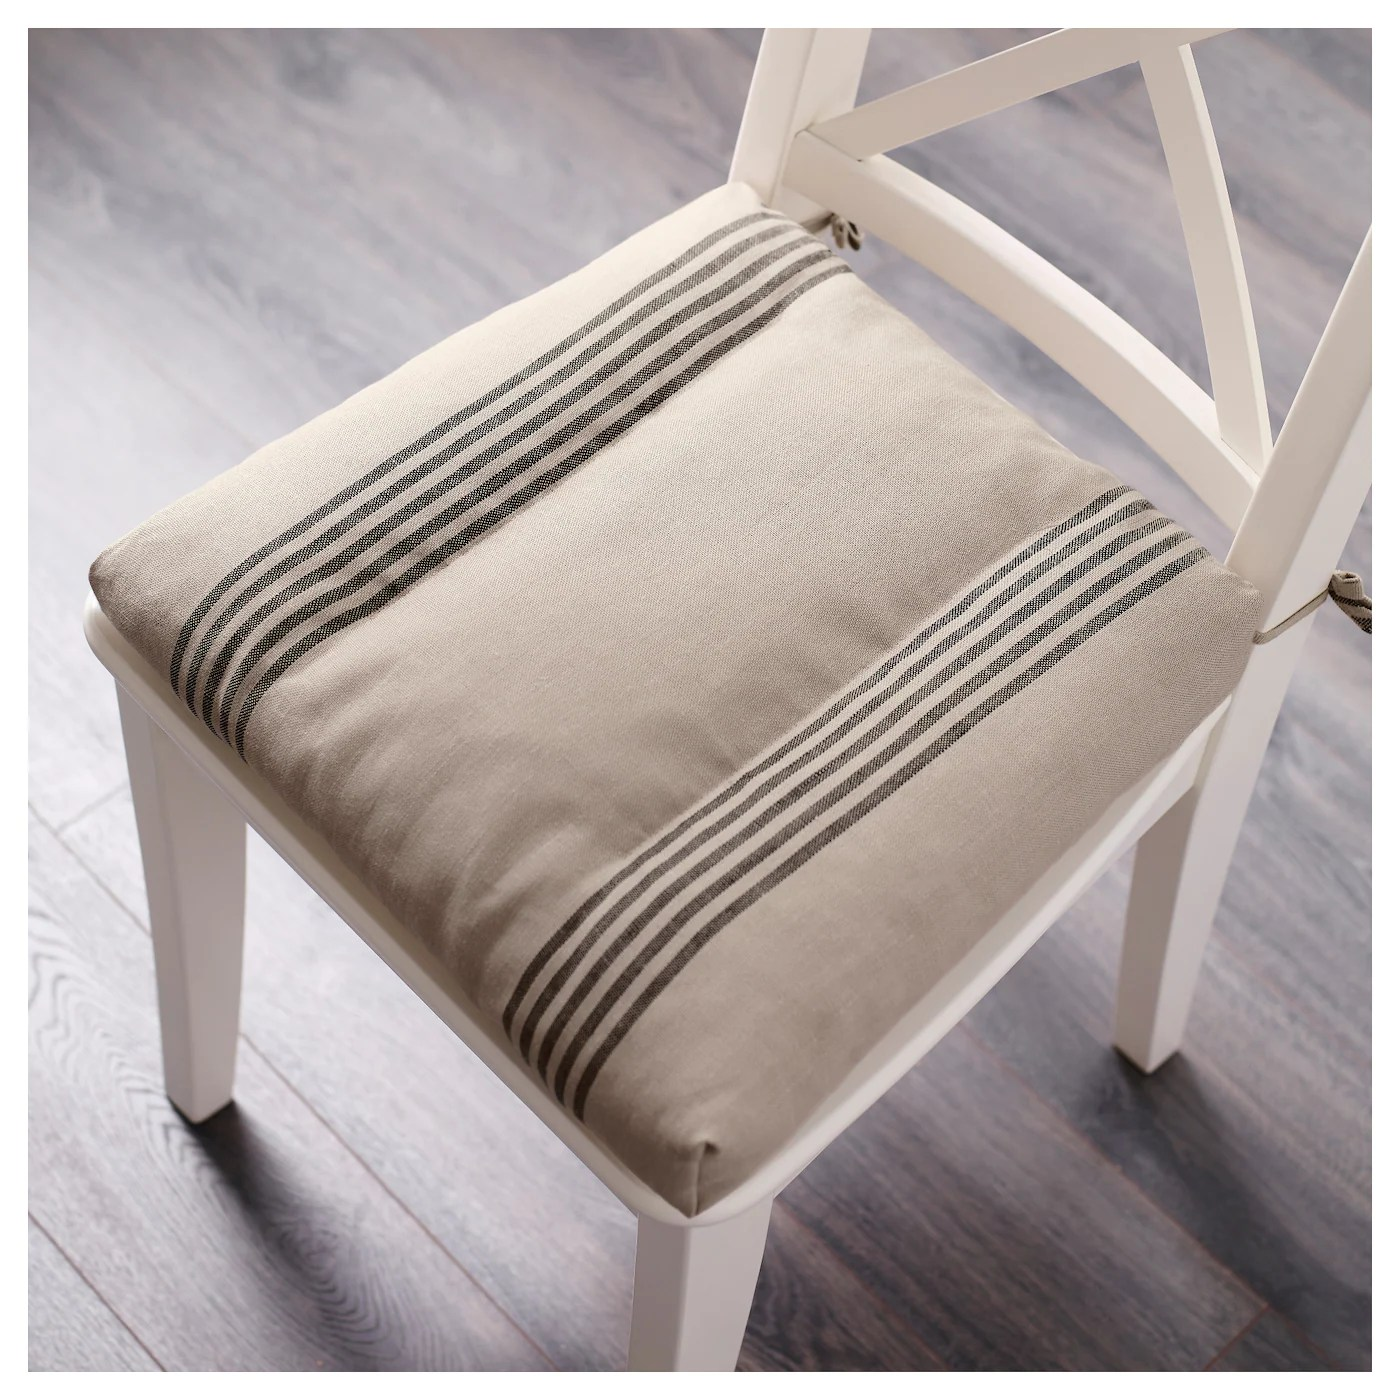 ikea chair cushions ak rocker gaming ullamaj cushion beige black 35 43 x 37 7 cm